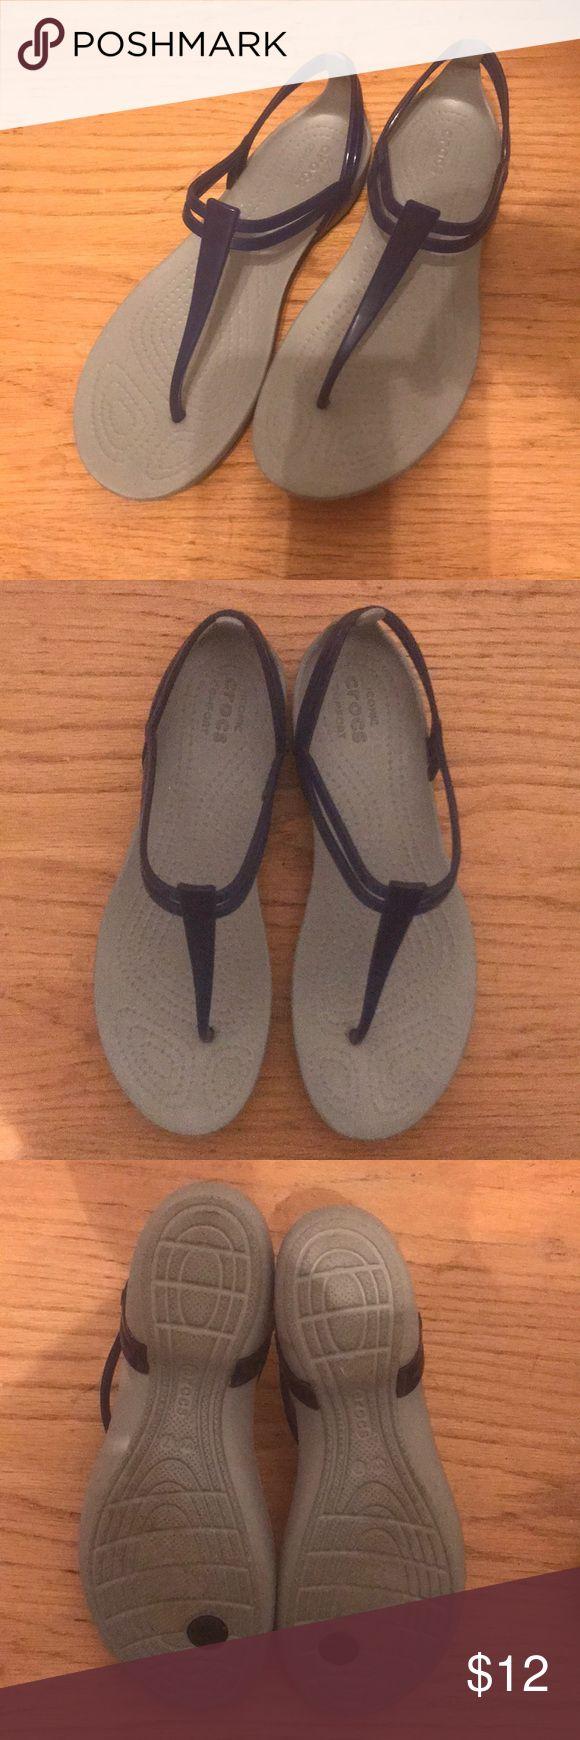 Blue crocs sandals. Size 7 Bright blue crocs thong sandals. Women's size 7. Comfy for summer. Waterproof for pool wear. CROCS Shoes Sandals